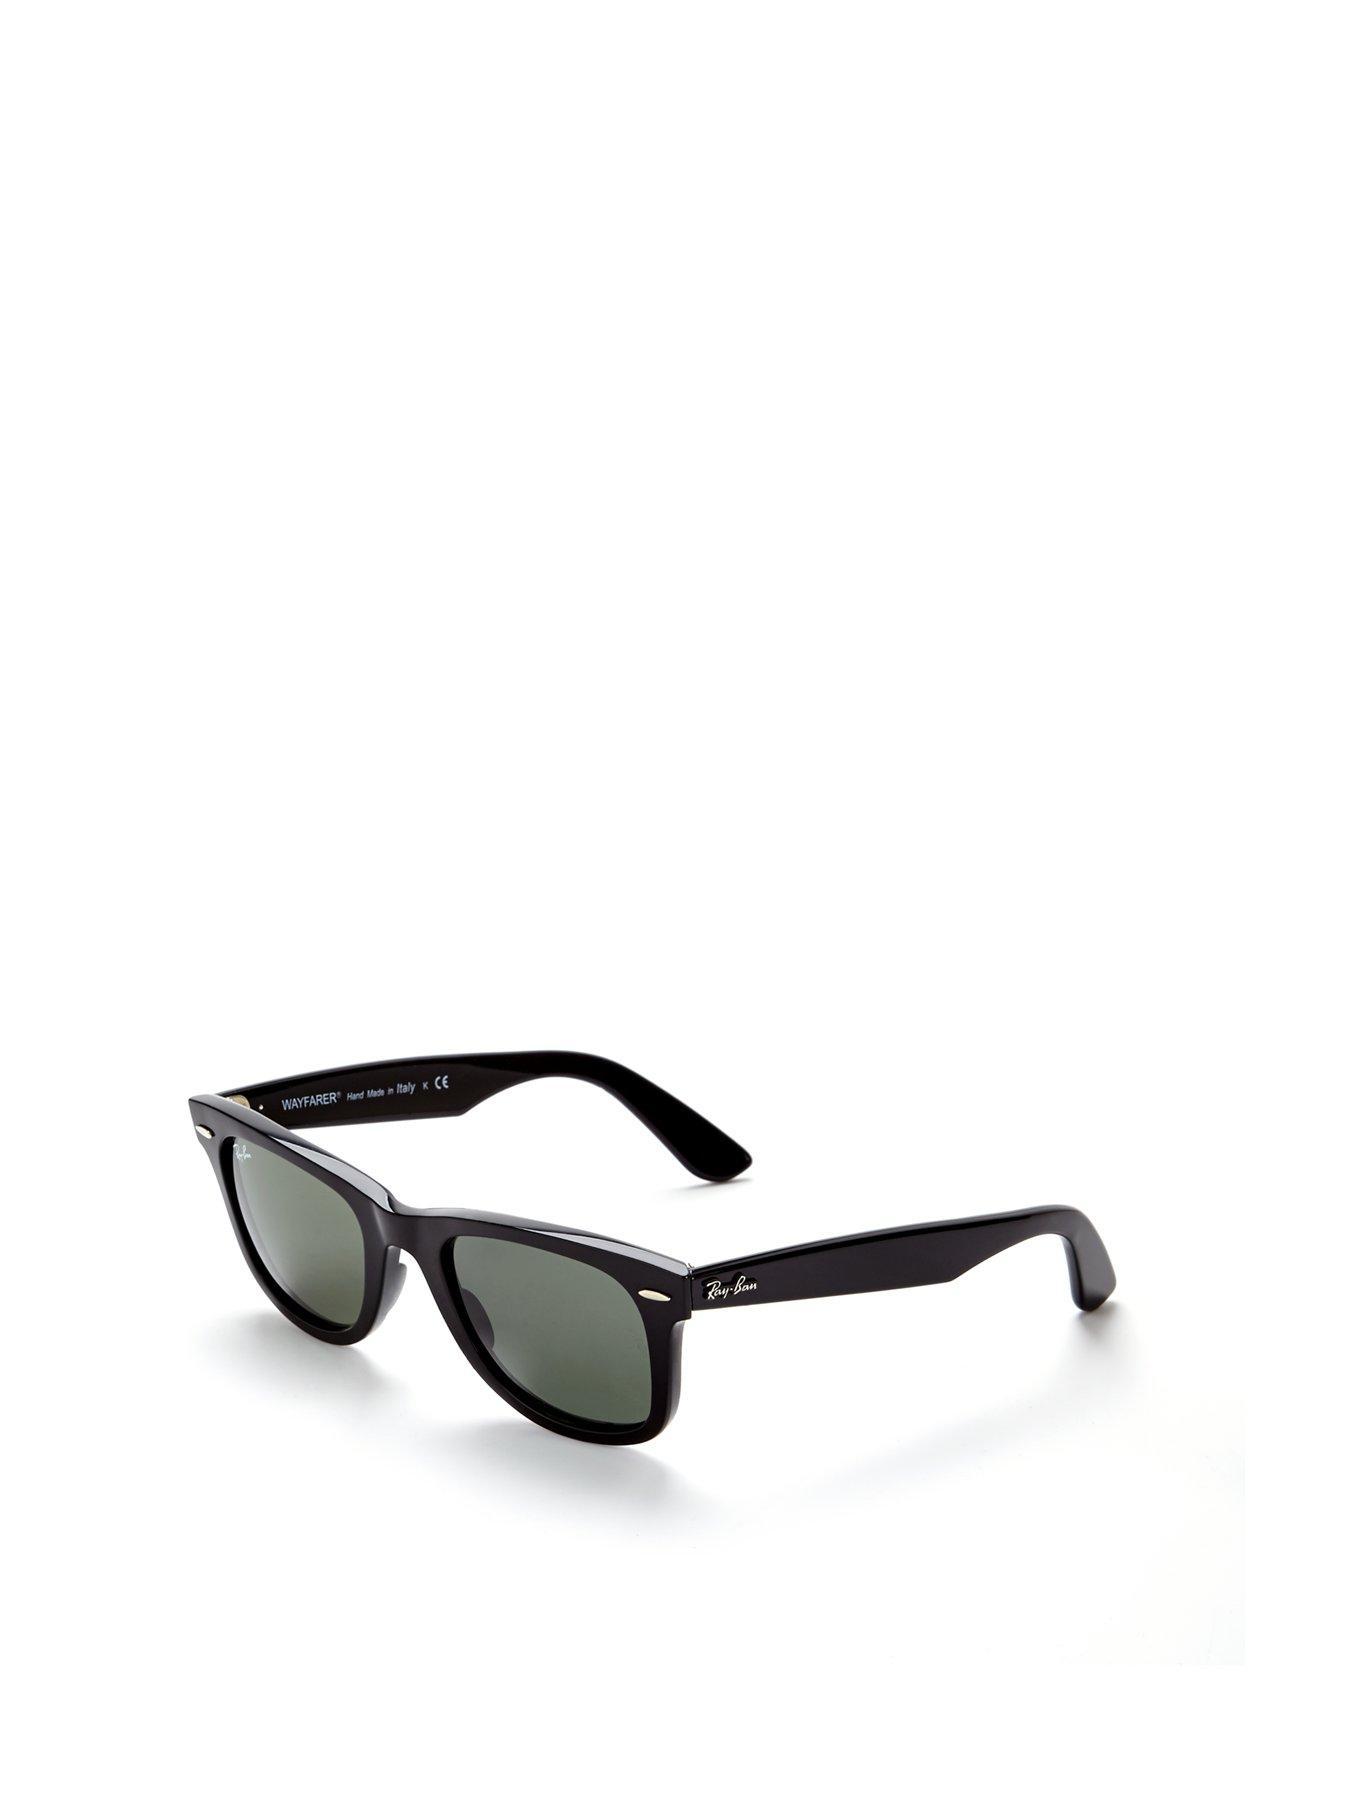 ray ban clubmaster sunglasses ireland  ray ban wayfarer sunglasses